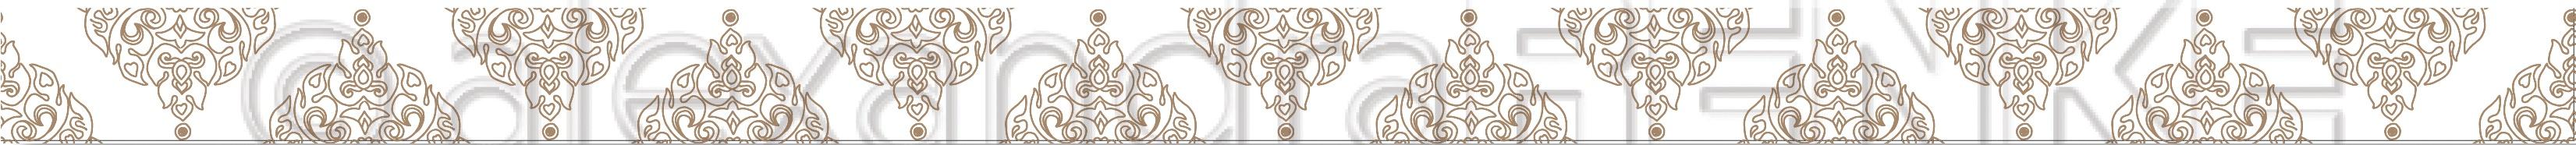 Alexandra Renke Washi Tape 20mmX10m-Balanced Gold Border, Ornamentic 2